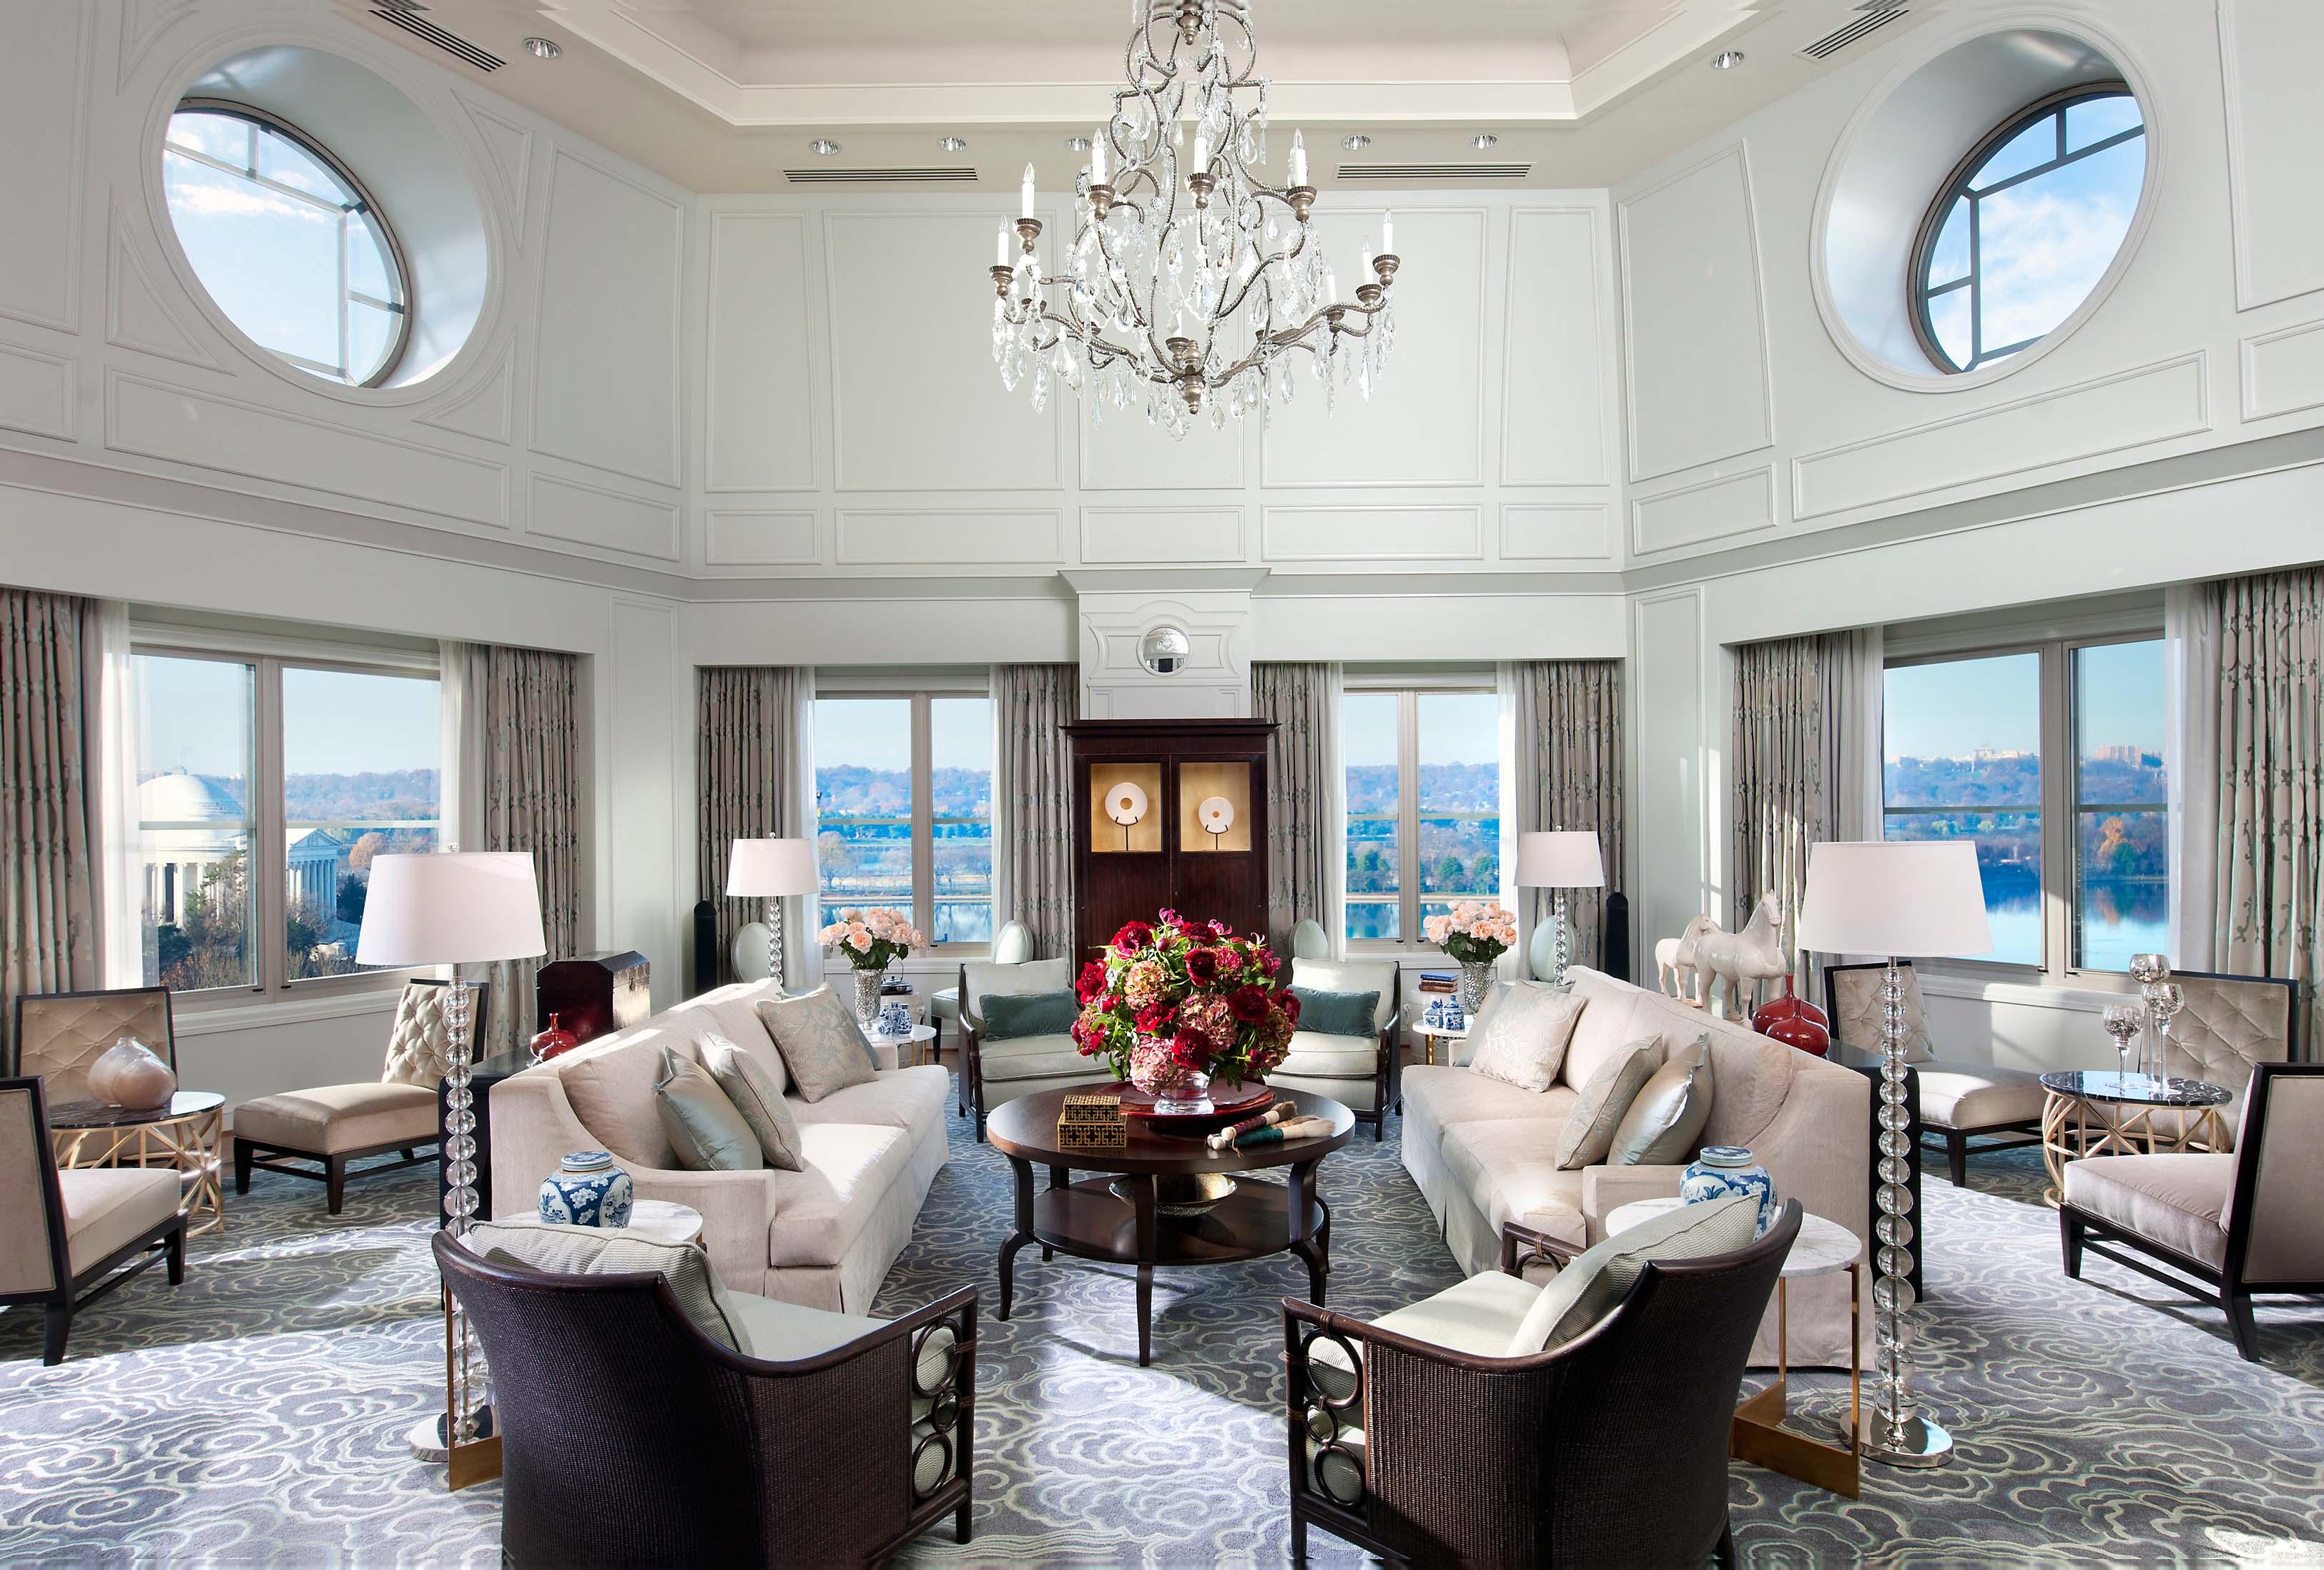 Mandarin oriental washington dc debut muze restaurant - Washington dc suites hotels 2 bedroom ...